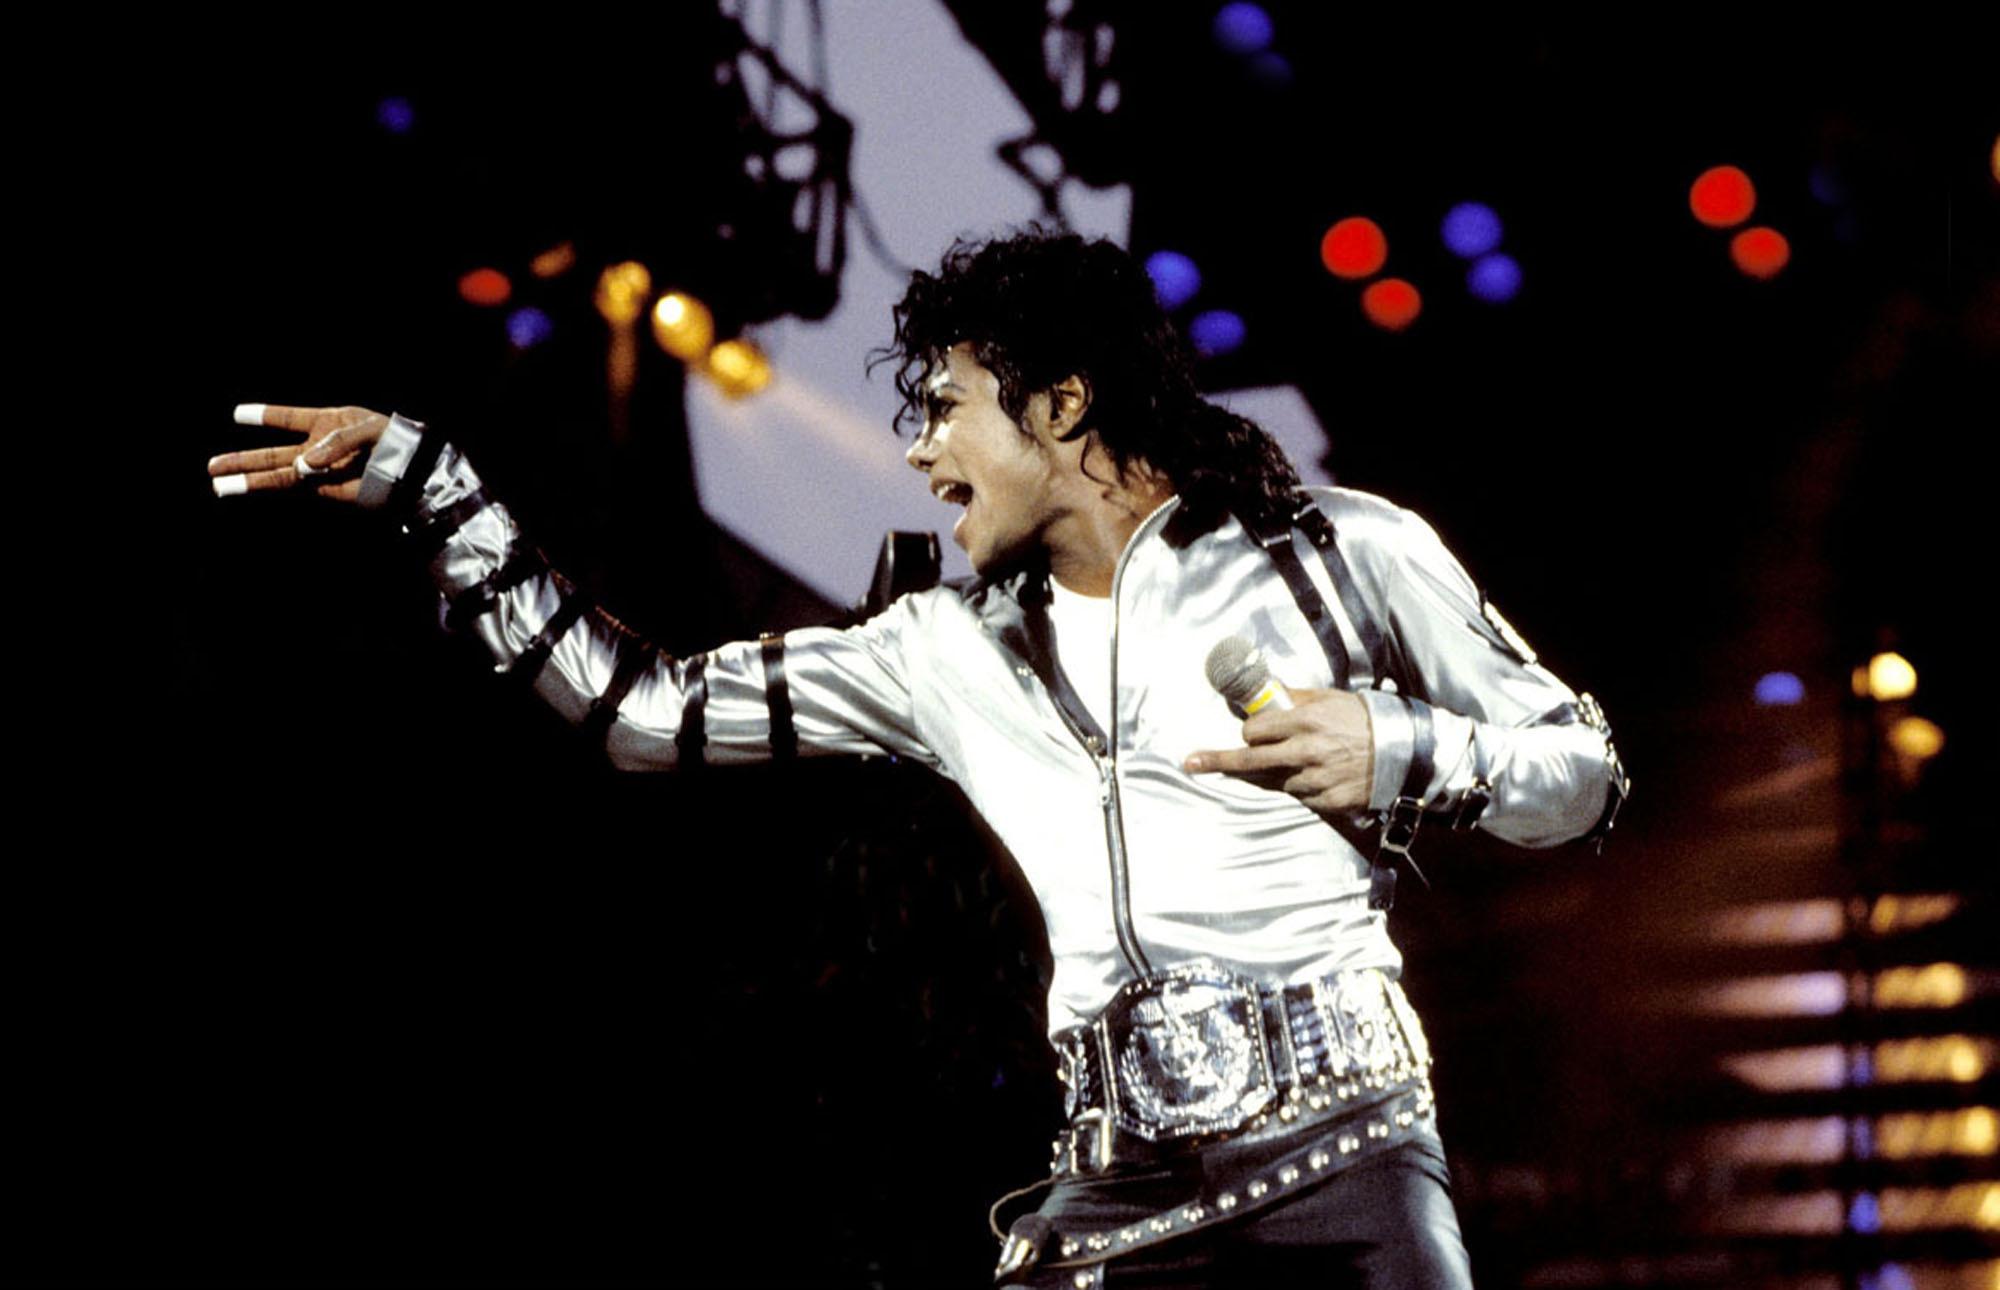 Michael Jackson Hd Wallpaper Background Image 2000x1290 Id